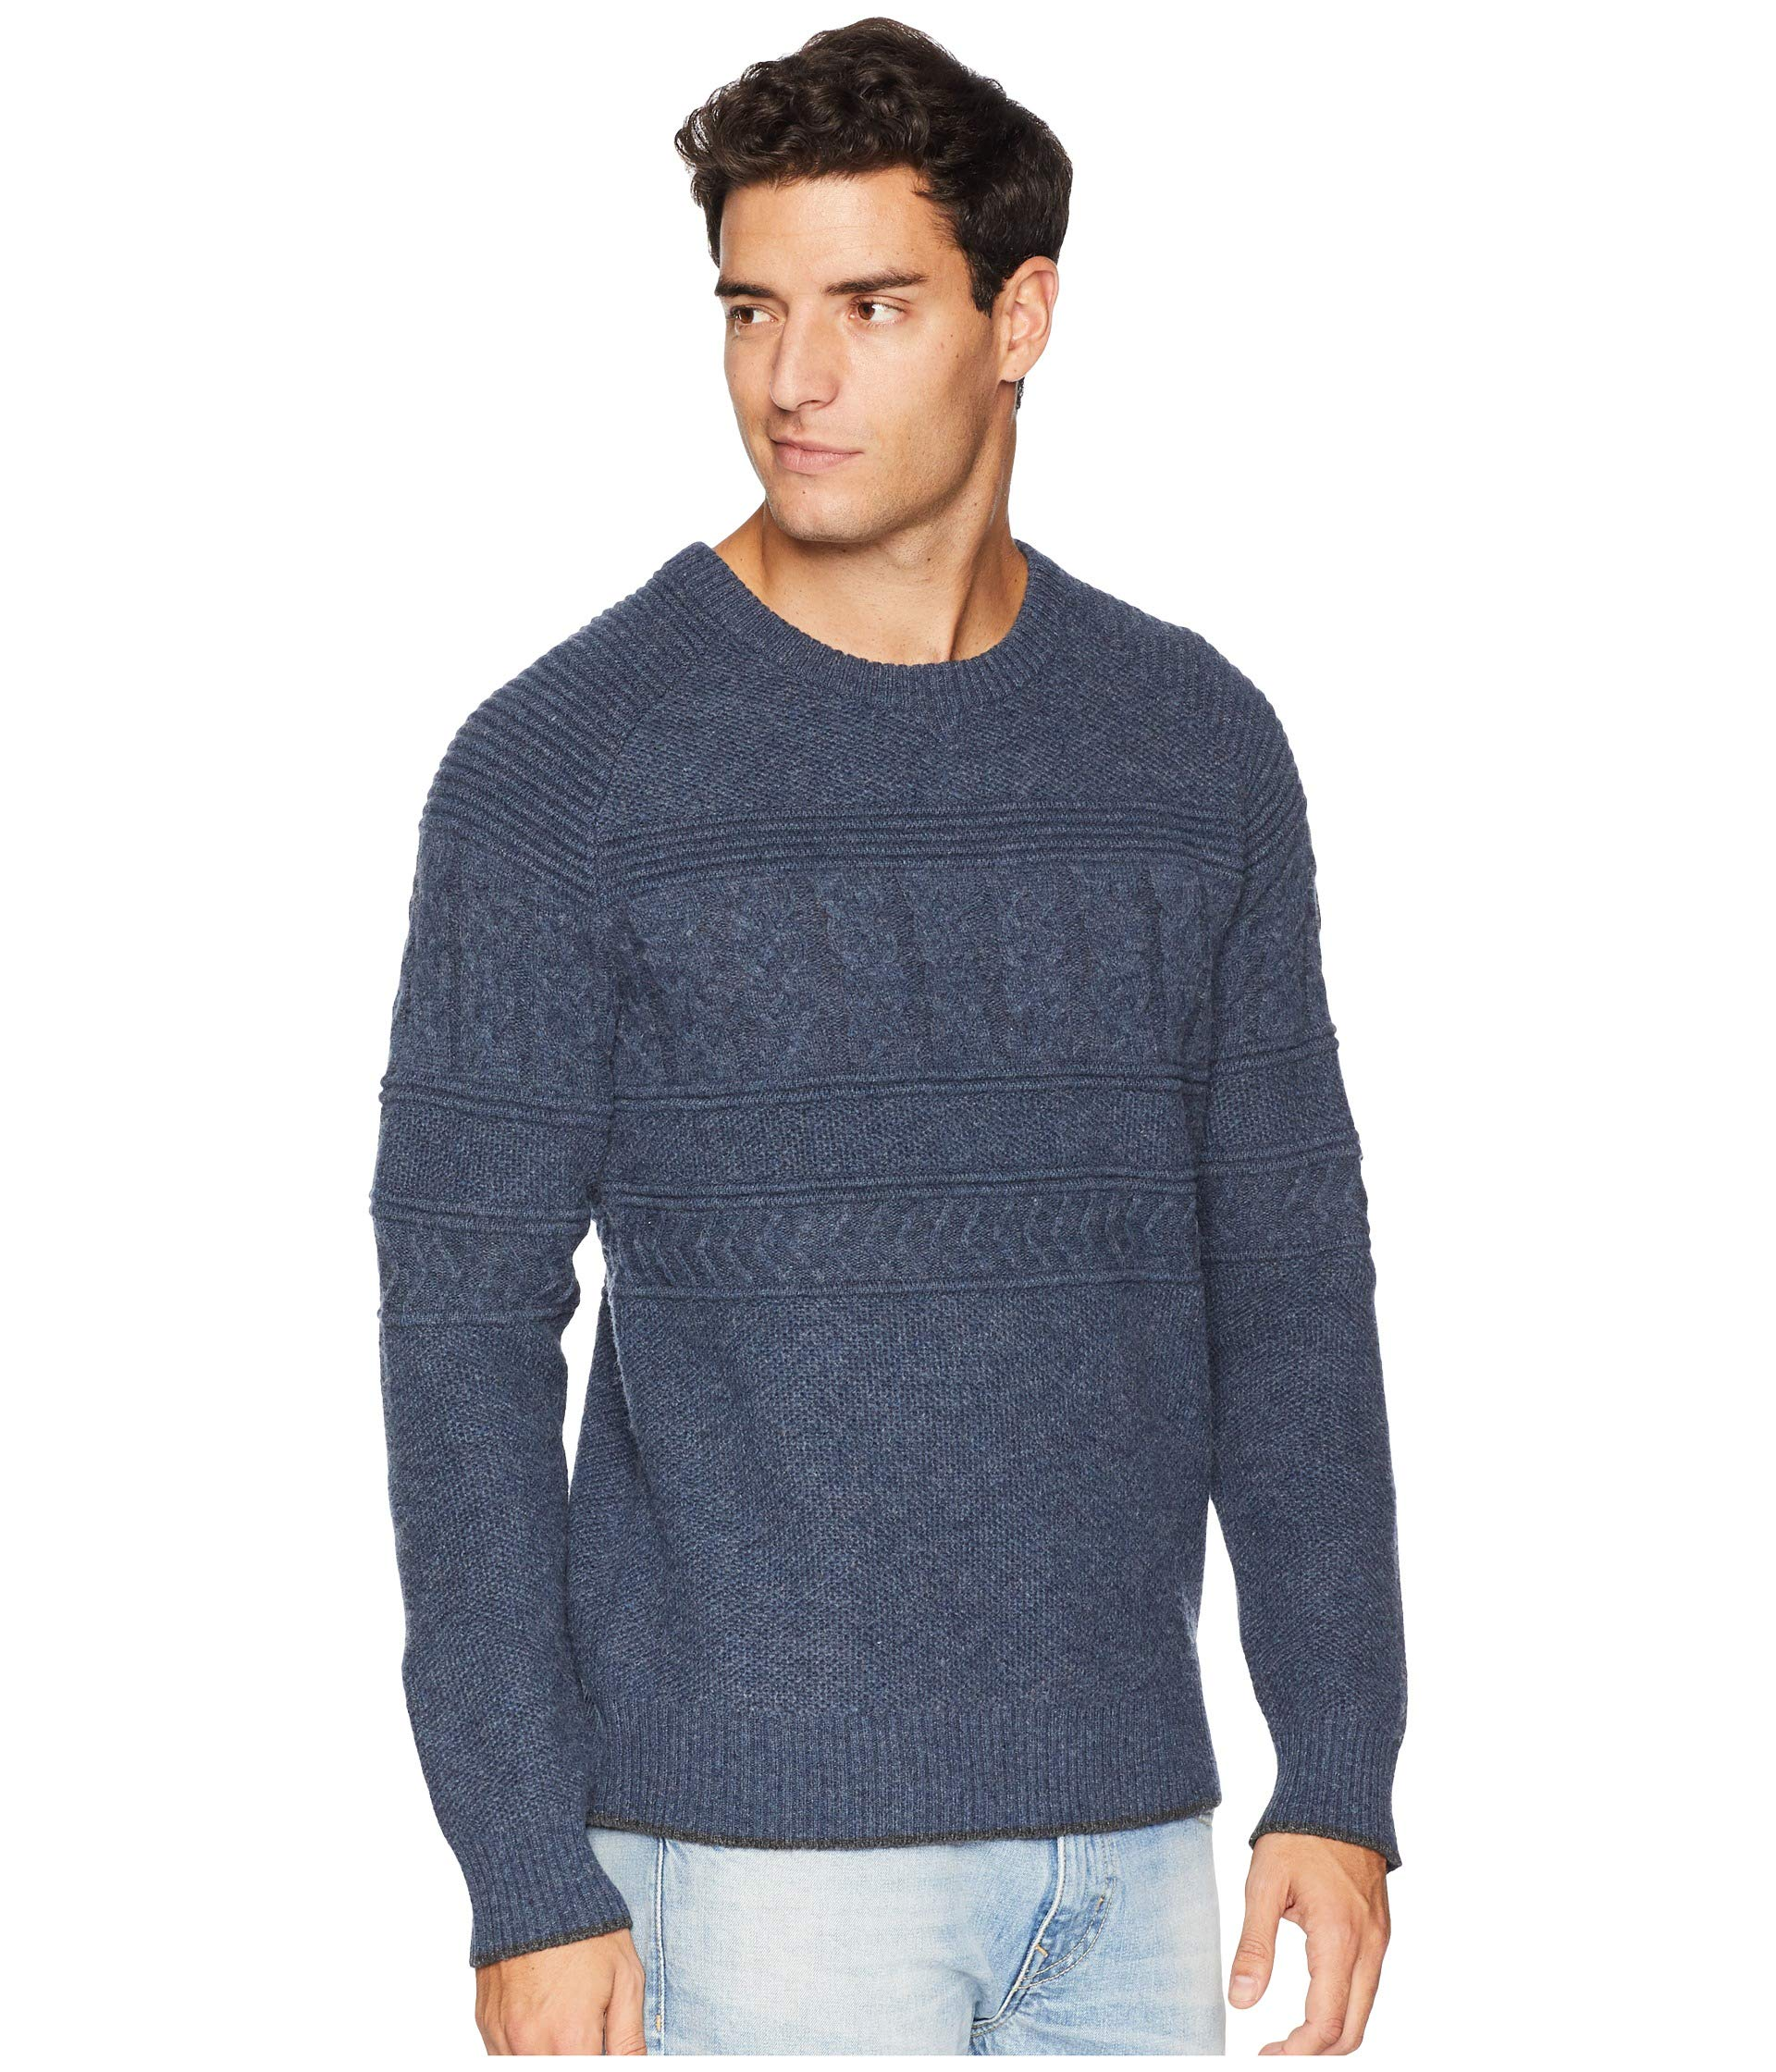 Sweater Textured Obermeyer Neck Trident Crew qxRtSz4